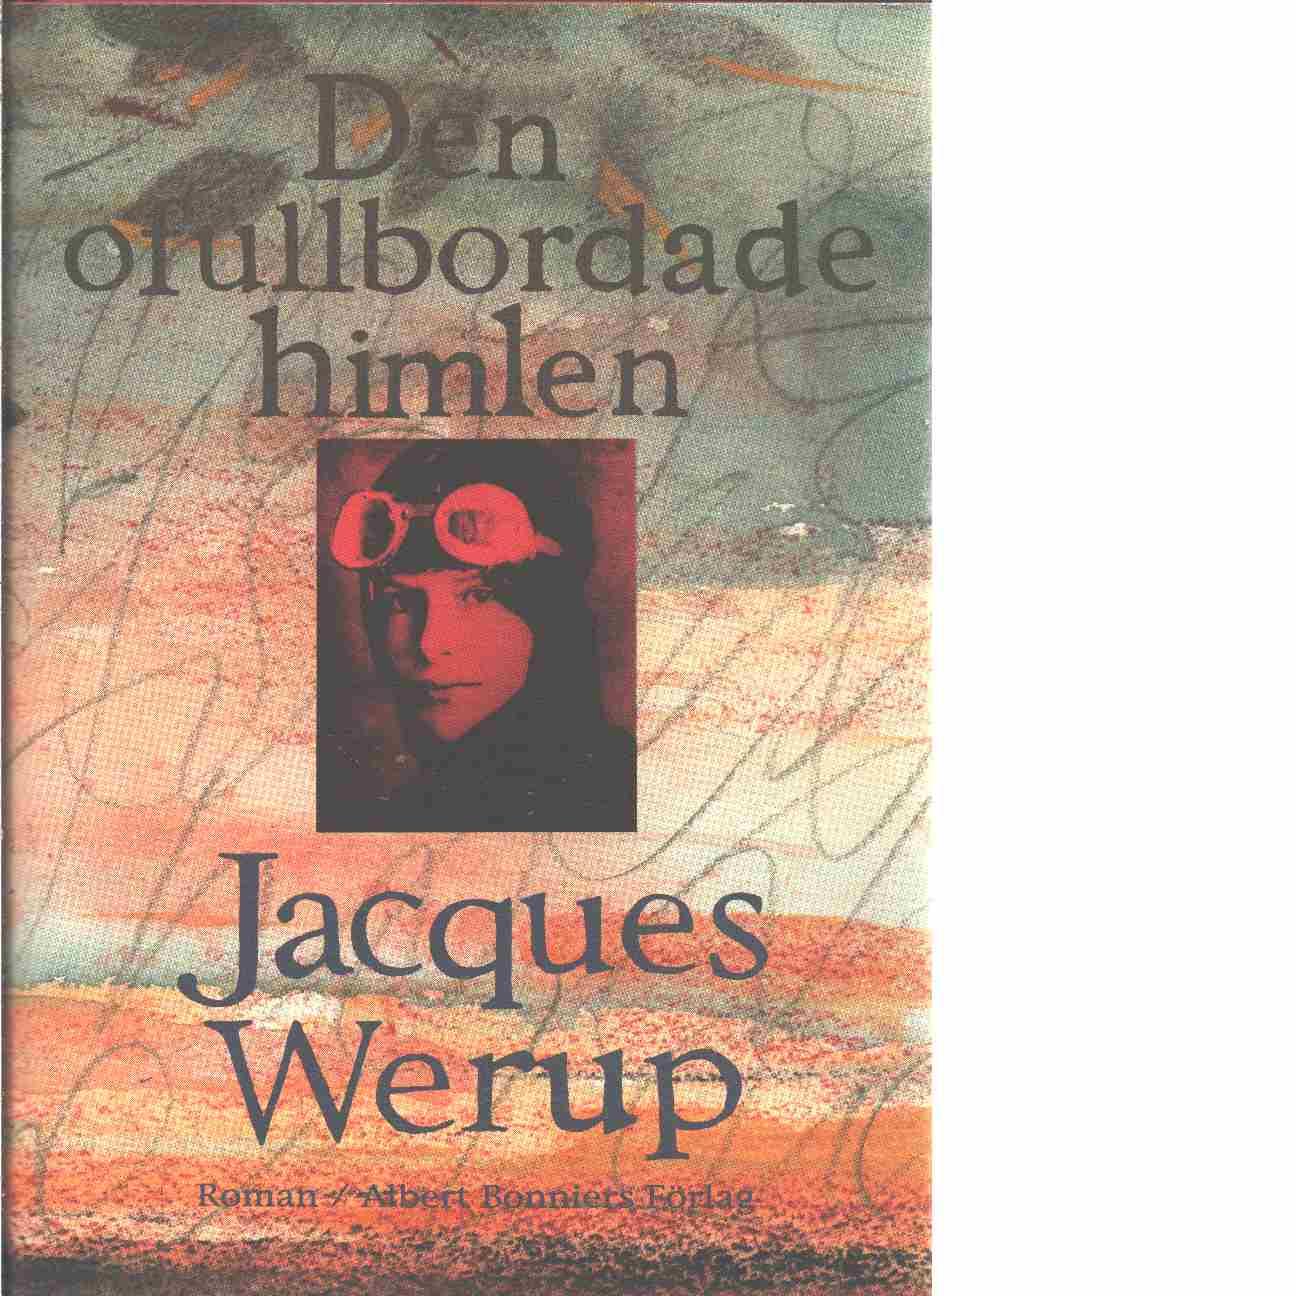 Den ofullbordade himlen - Werup, Jacques